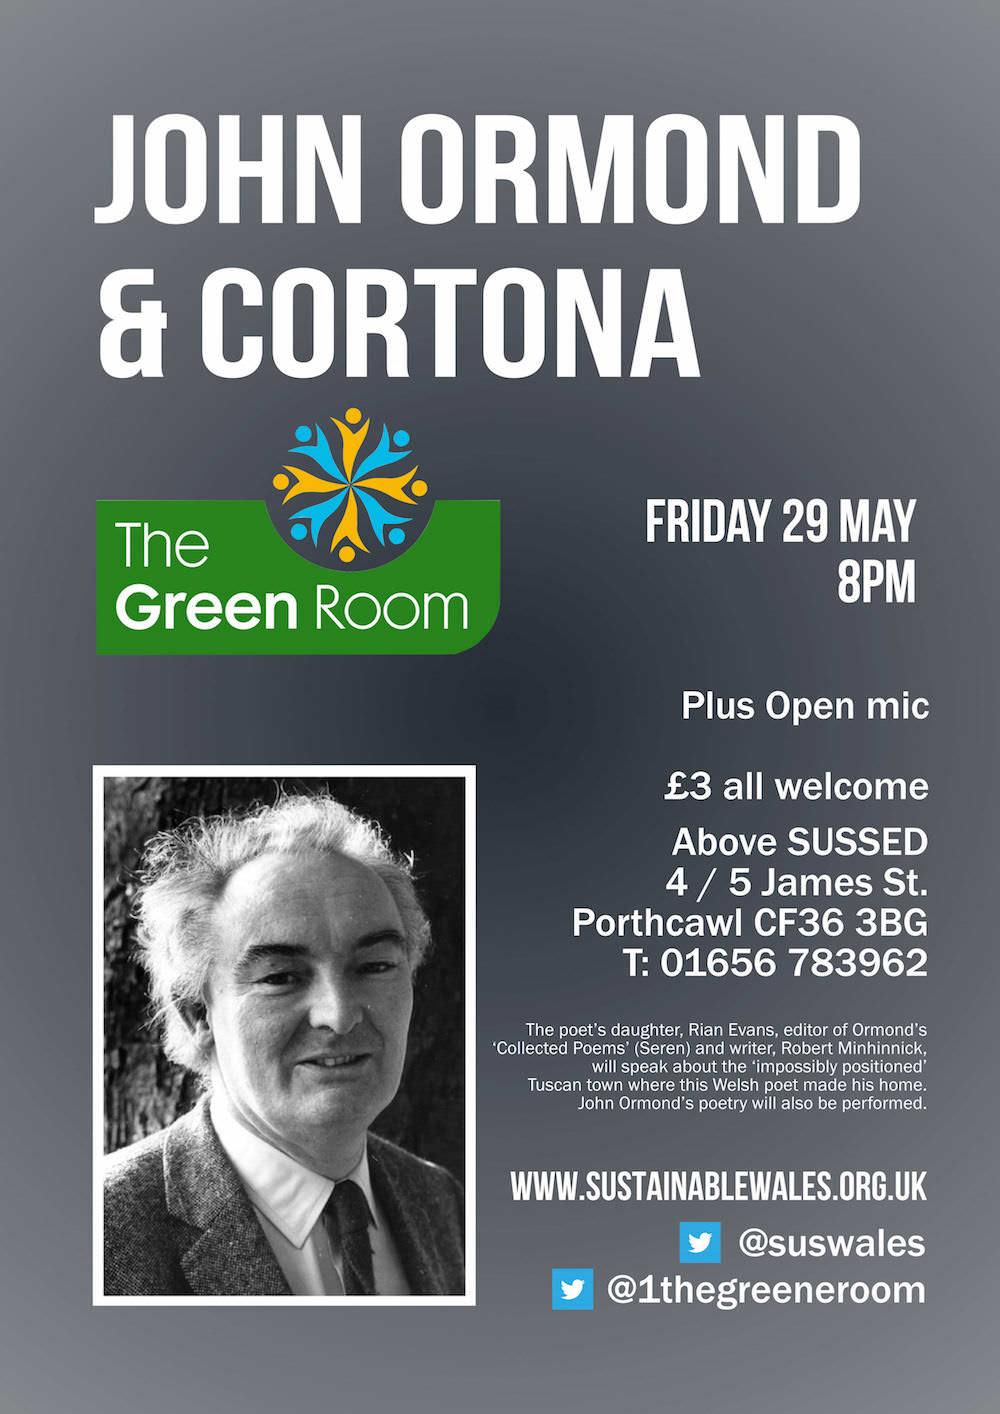 John Ormond green room May 2015 web.jpg